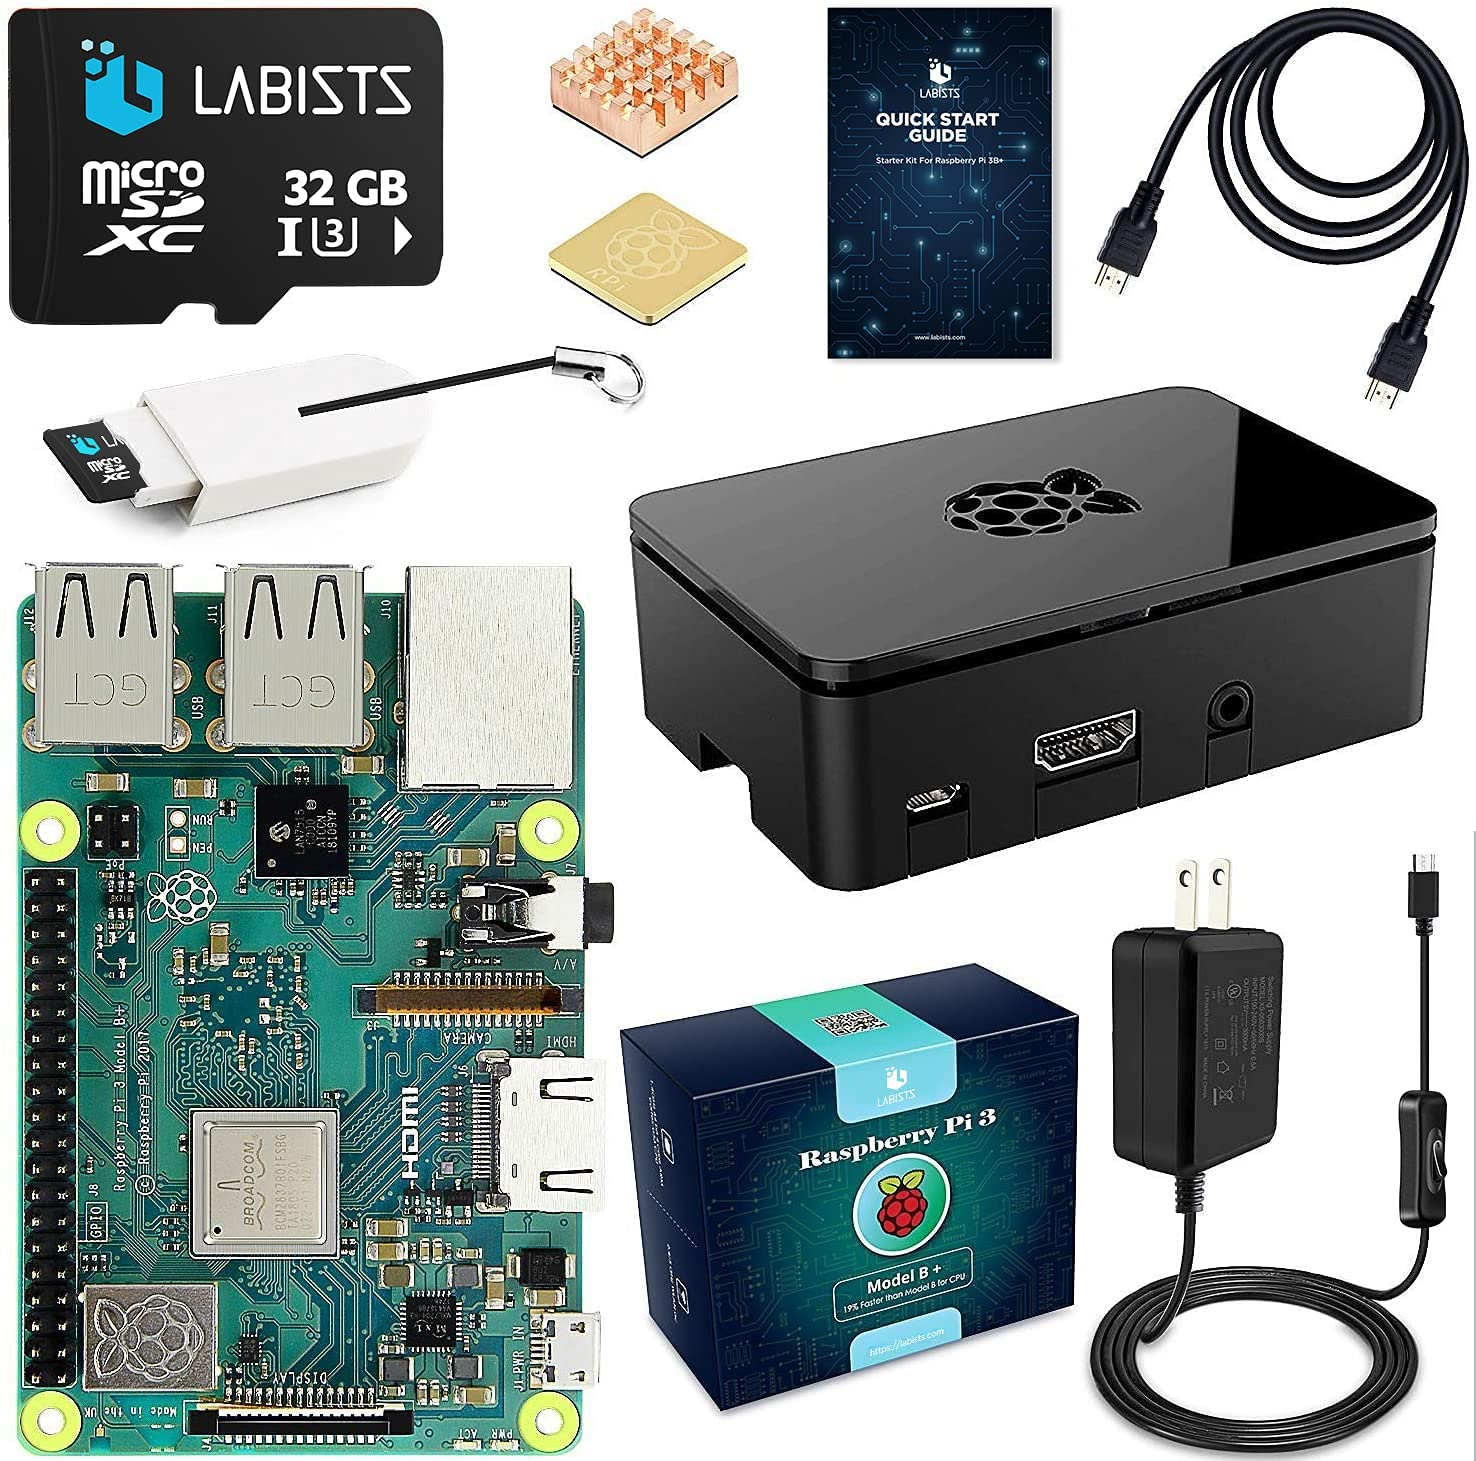 Raspberry Pi 3 B+/B Plus Starter Kit with 32GB Micro SD Card Noobs Model B Plus Motherboard Premium Black Case Copper Heat Sinks